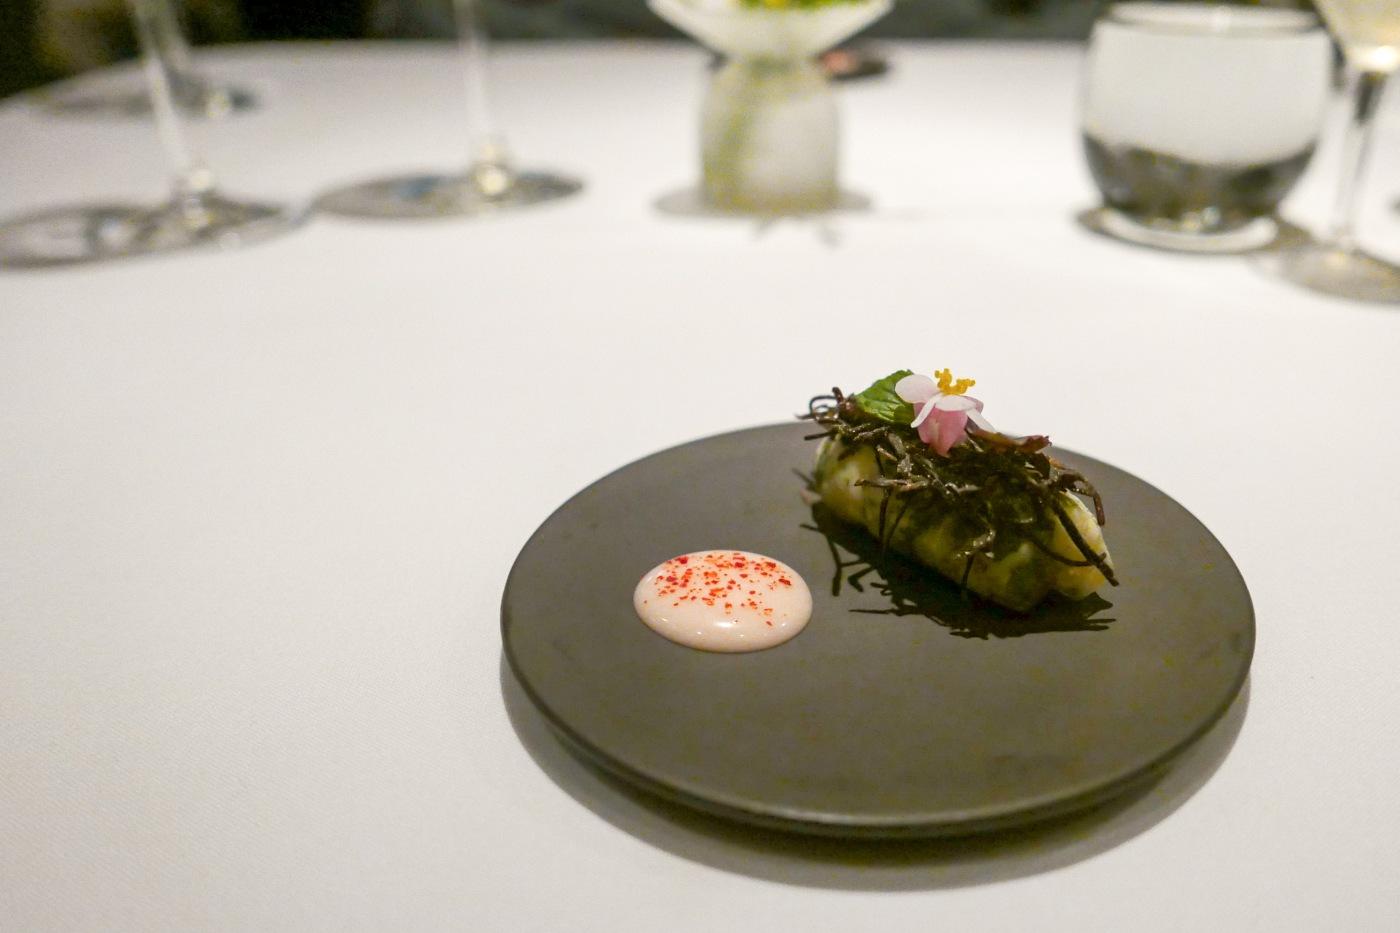 SCOTTISH LANGOUSTINE spring roll with shio kombu, rhubarb and mint